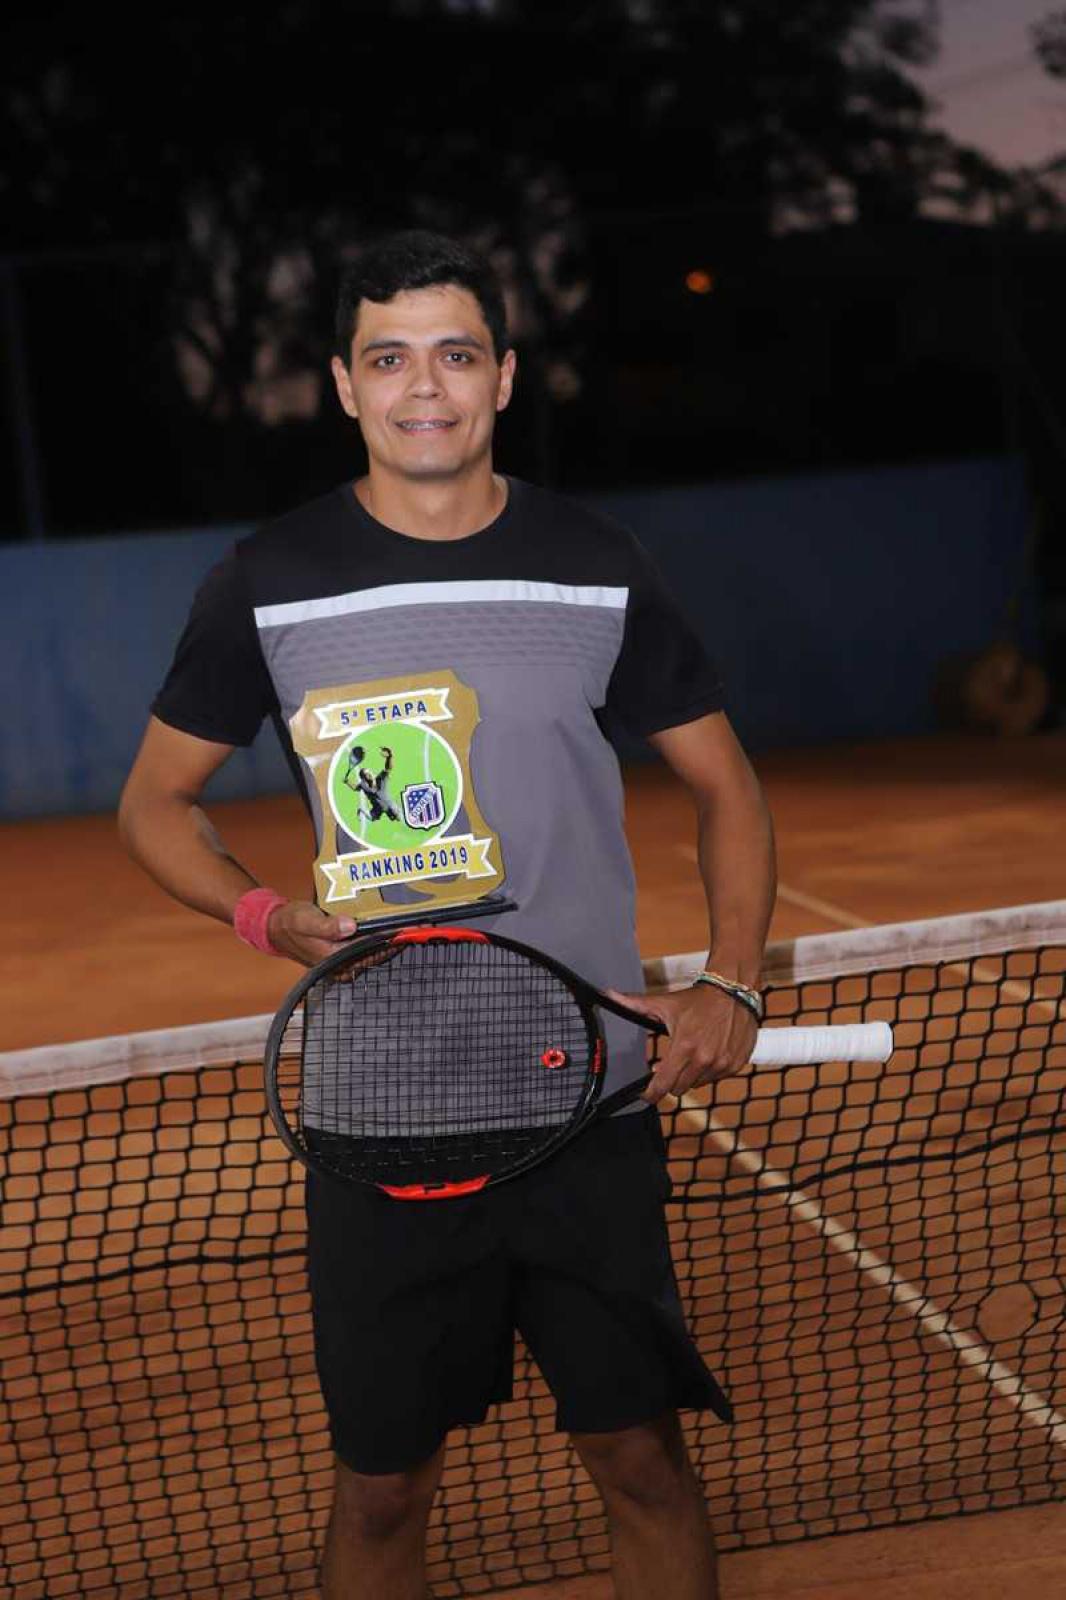 V Etapa do Ranking de Tênis 2019